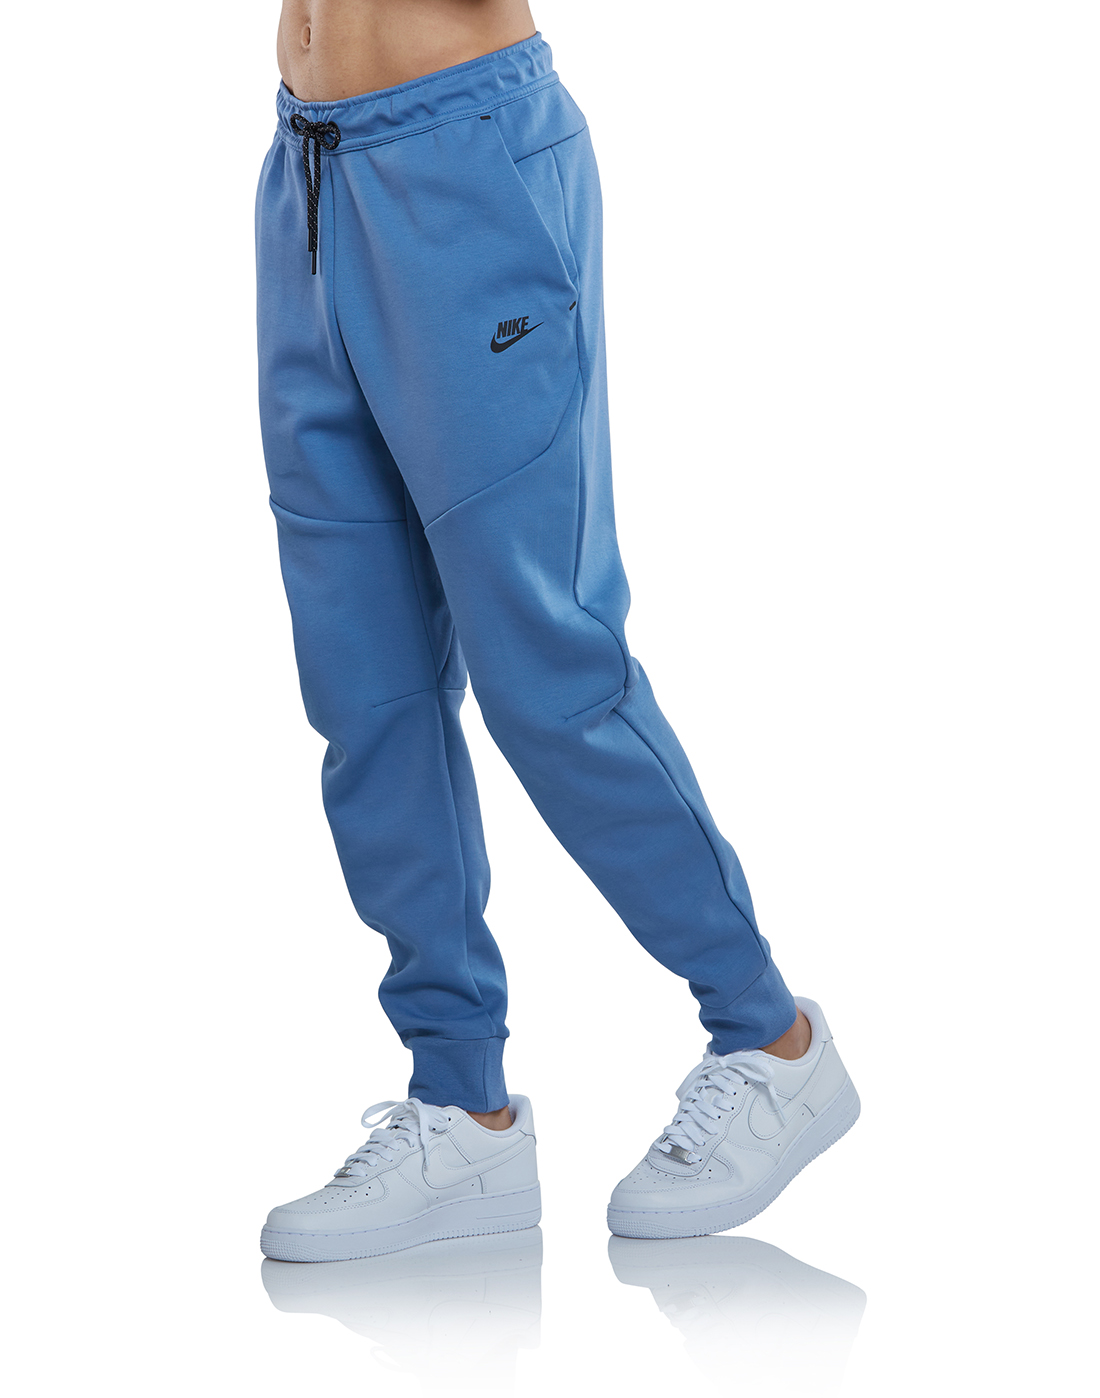 Nike Mens Tech Fleece Joggers Blue Life Style Sports Ie